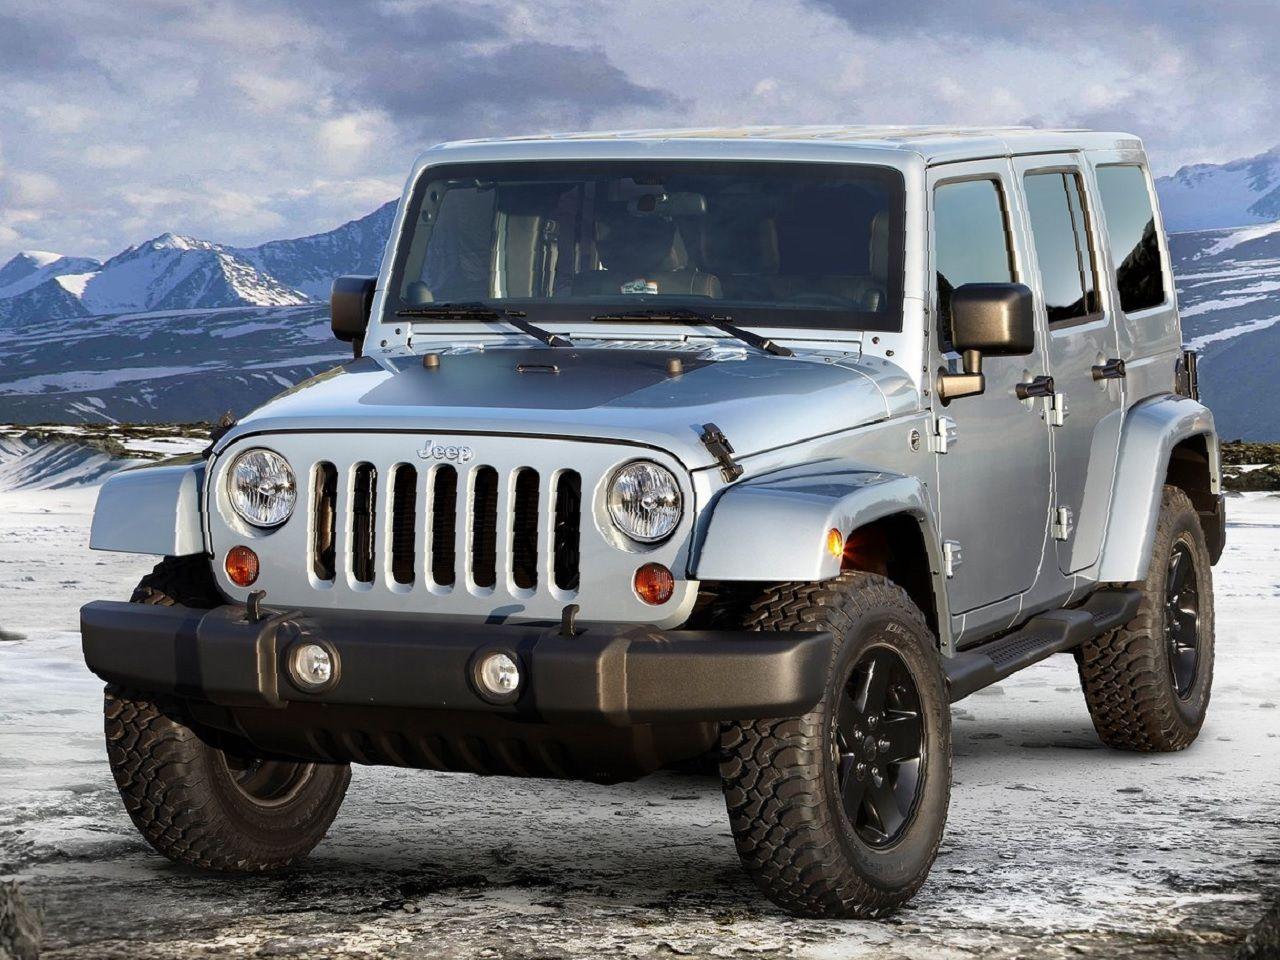 Jeep Marka Wrangler Arctic 2012 Model Araba Duvar Kağıdı Jeep Araba Duvar Kağıdı